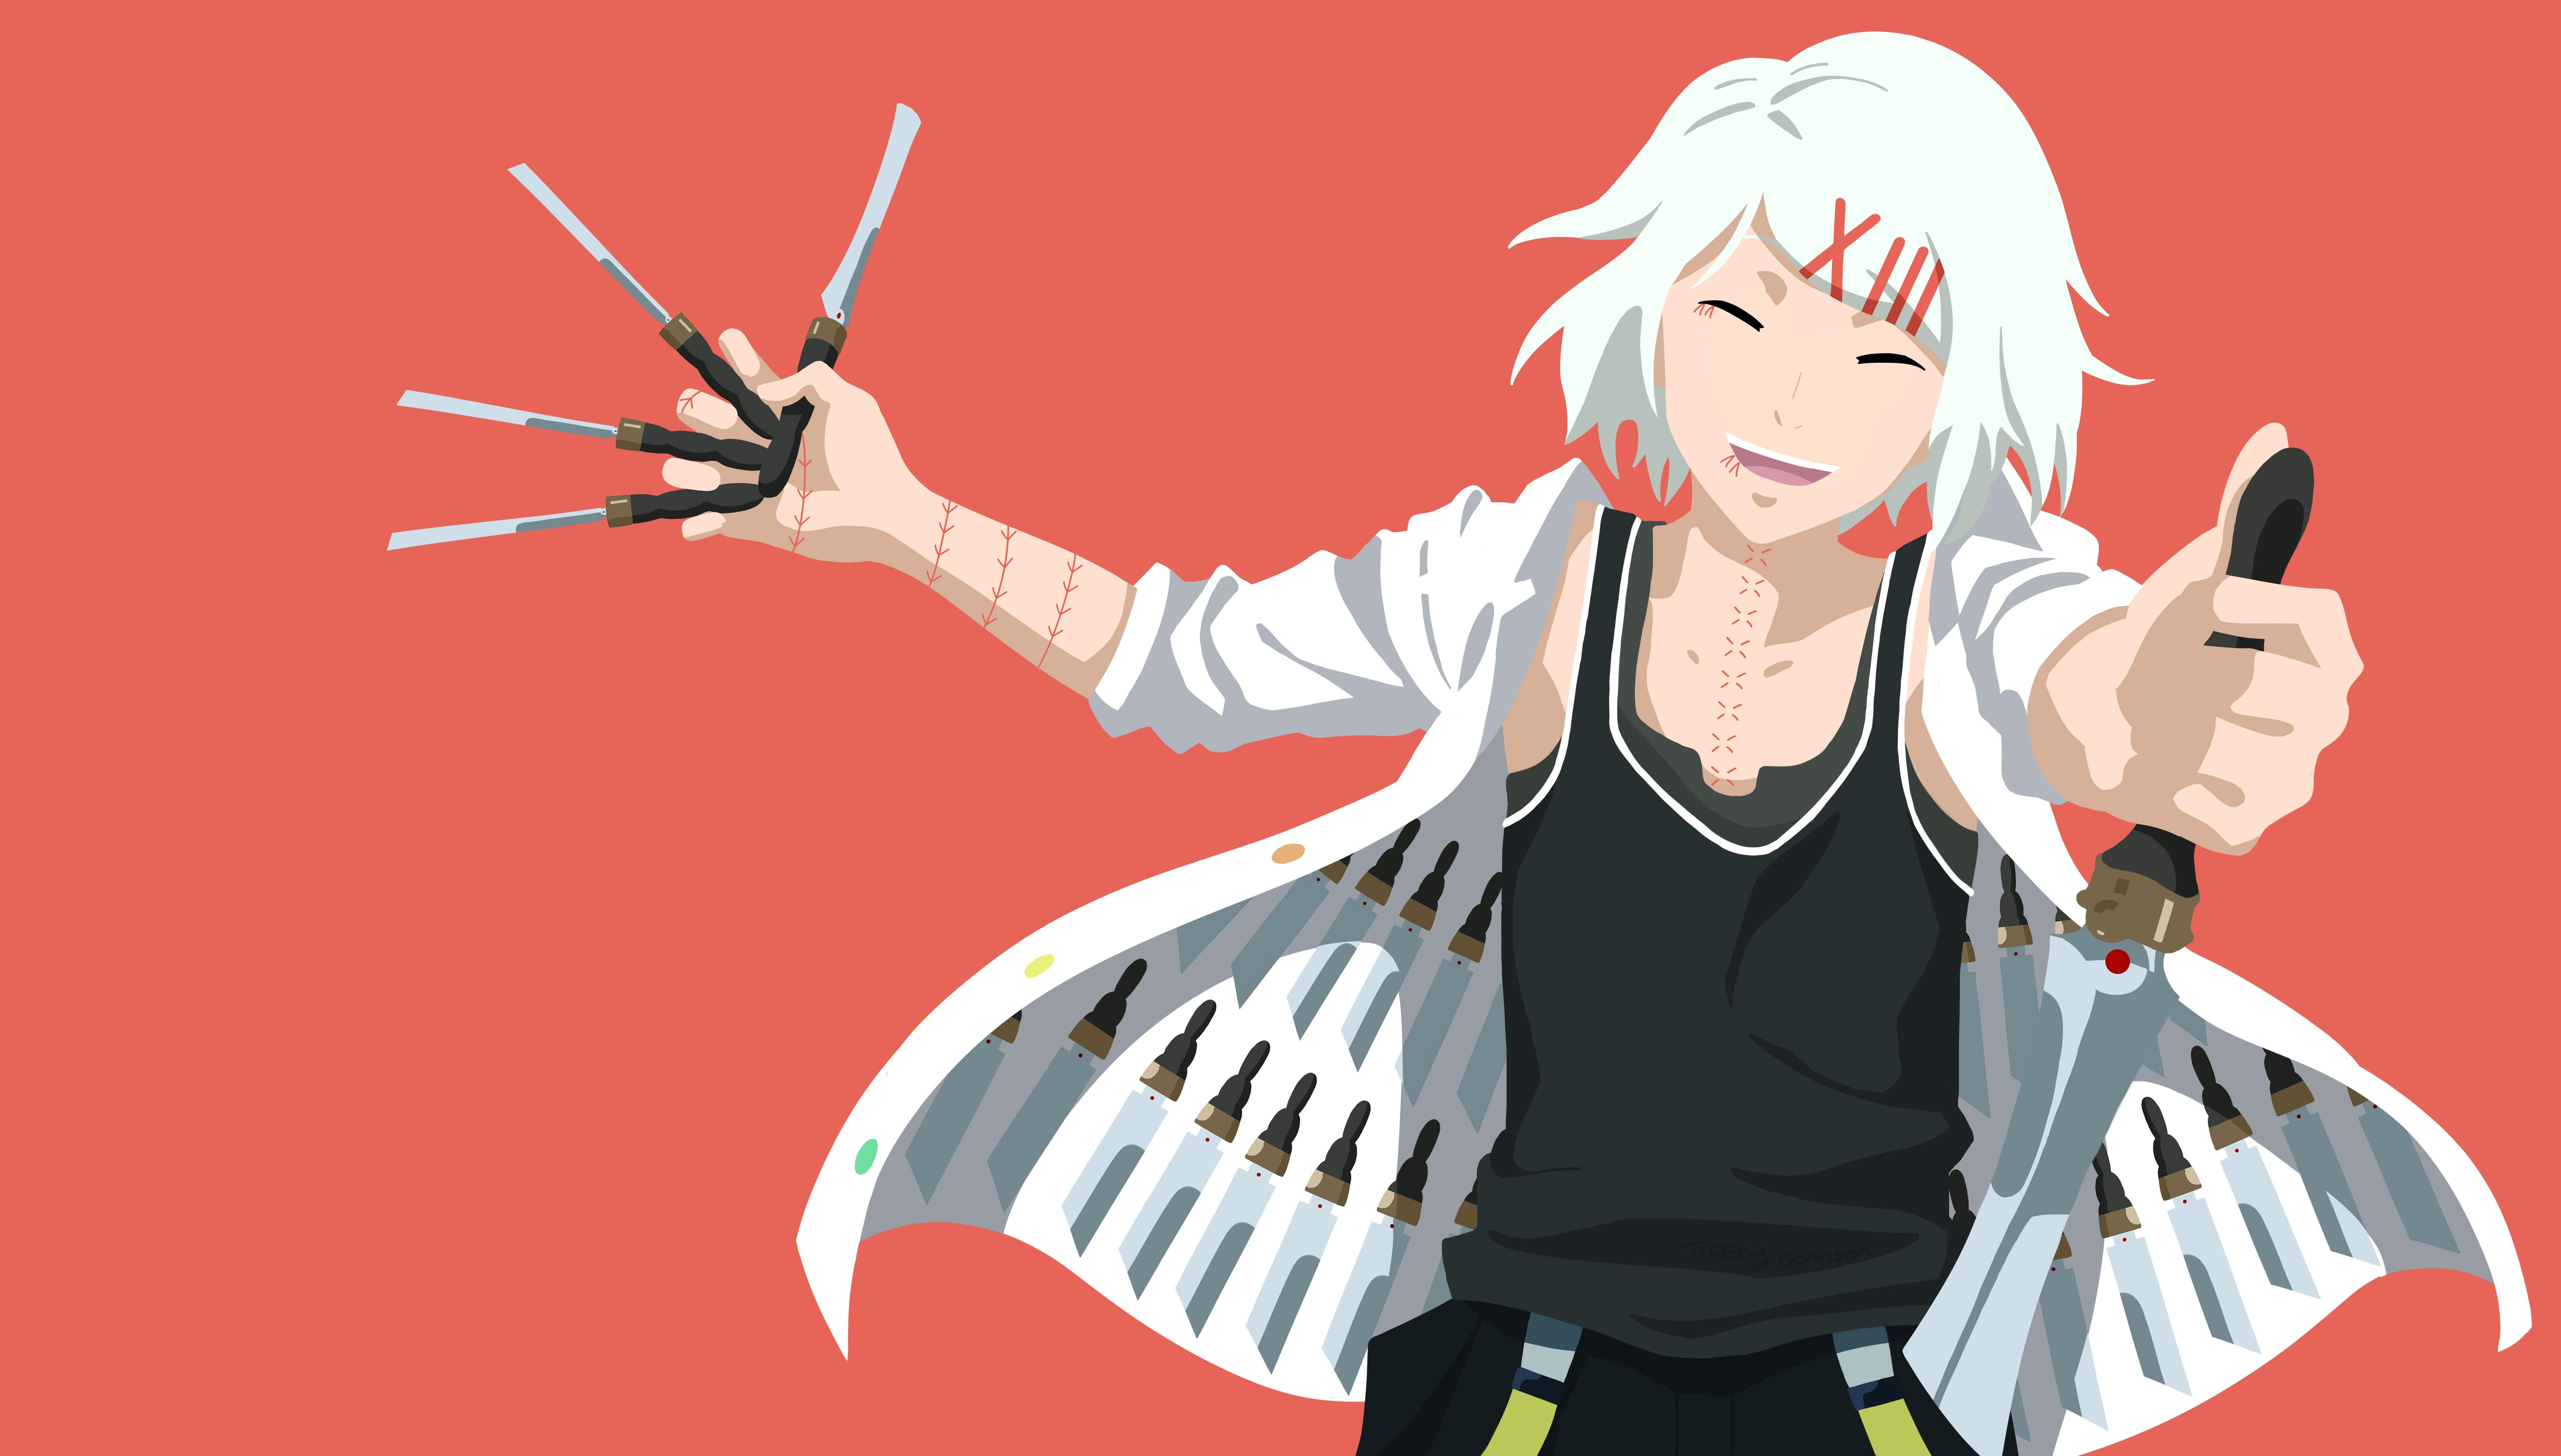 Wallpaper : illustration, anime boys, cartoon, Tokyo Ghoul ...